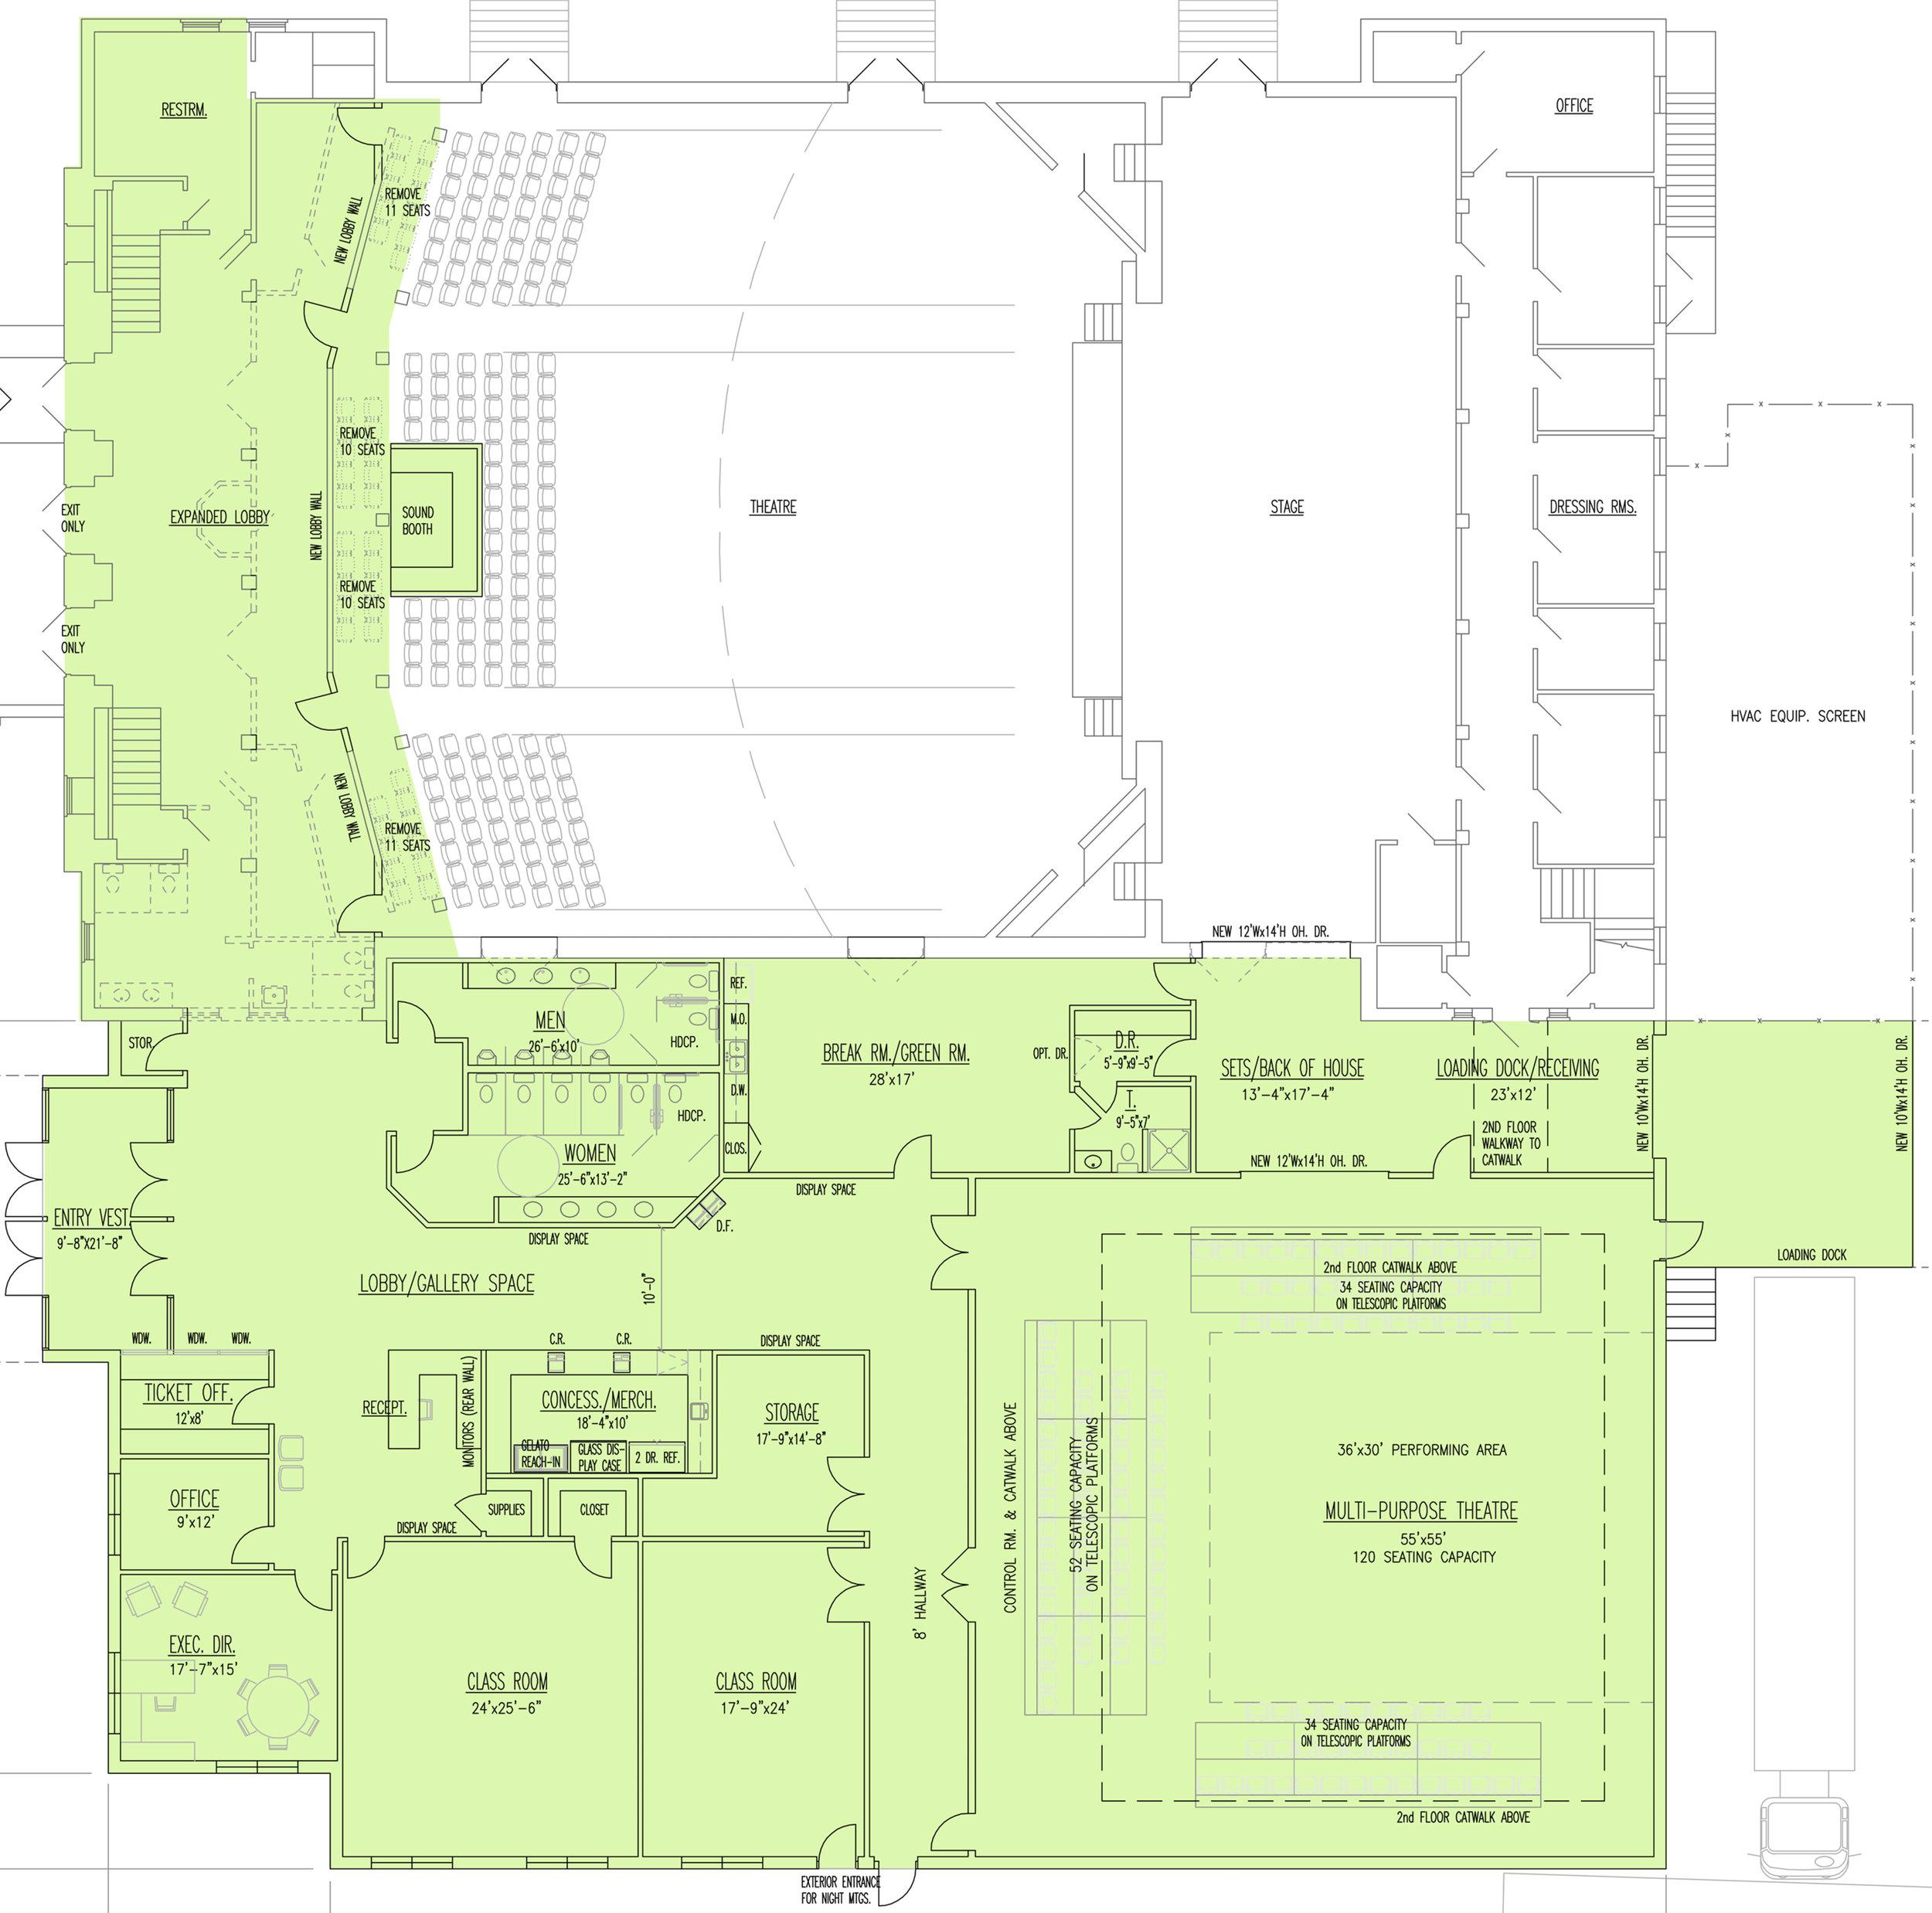 PAC Renovation Floor Plan